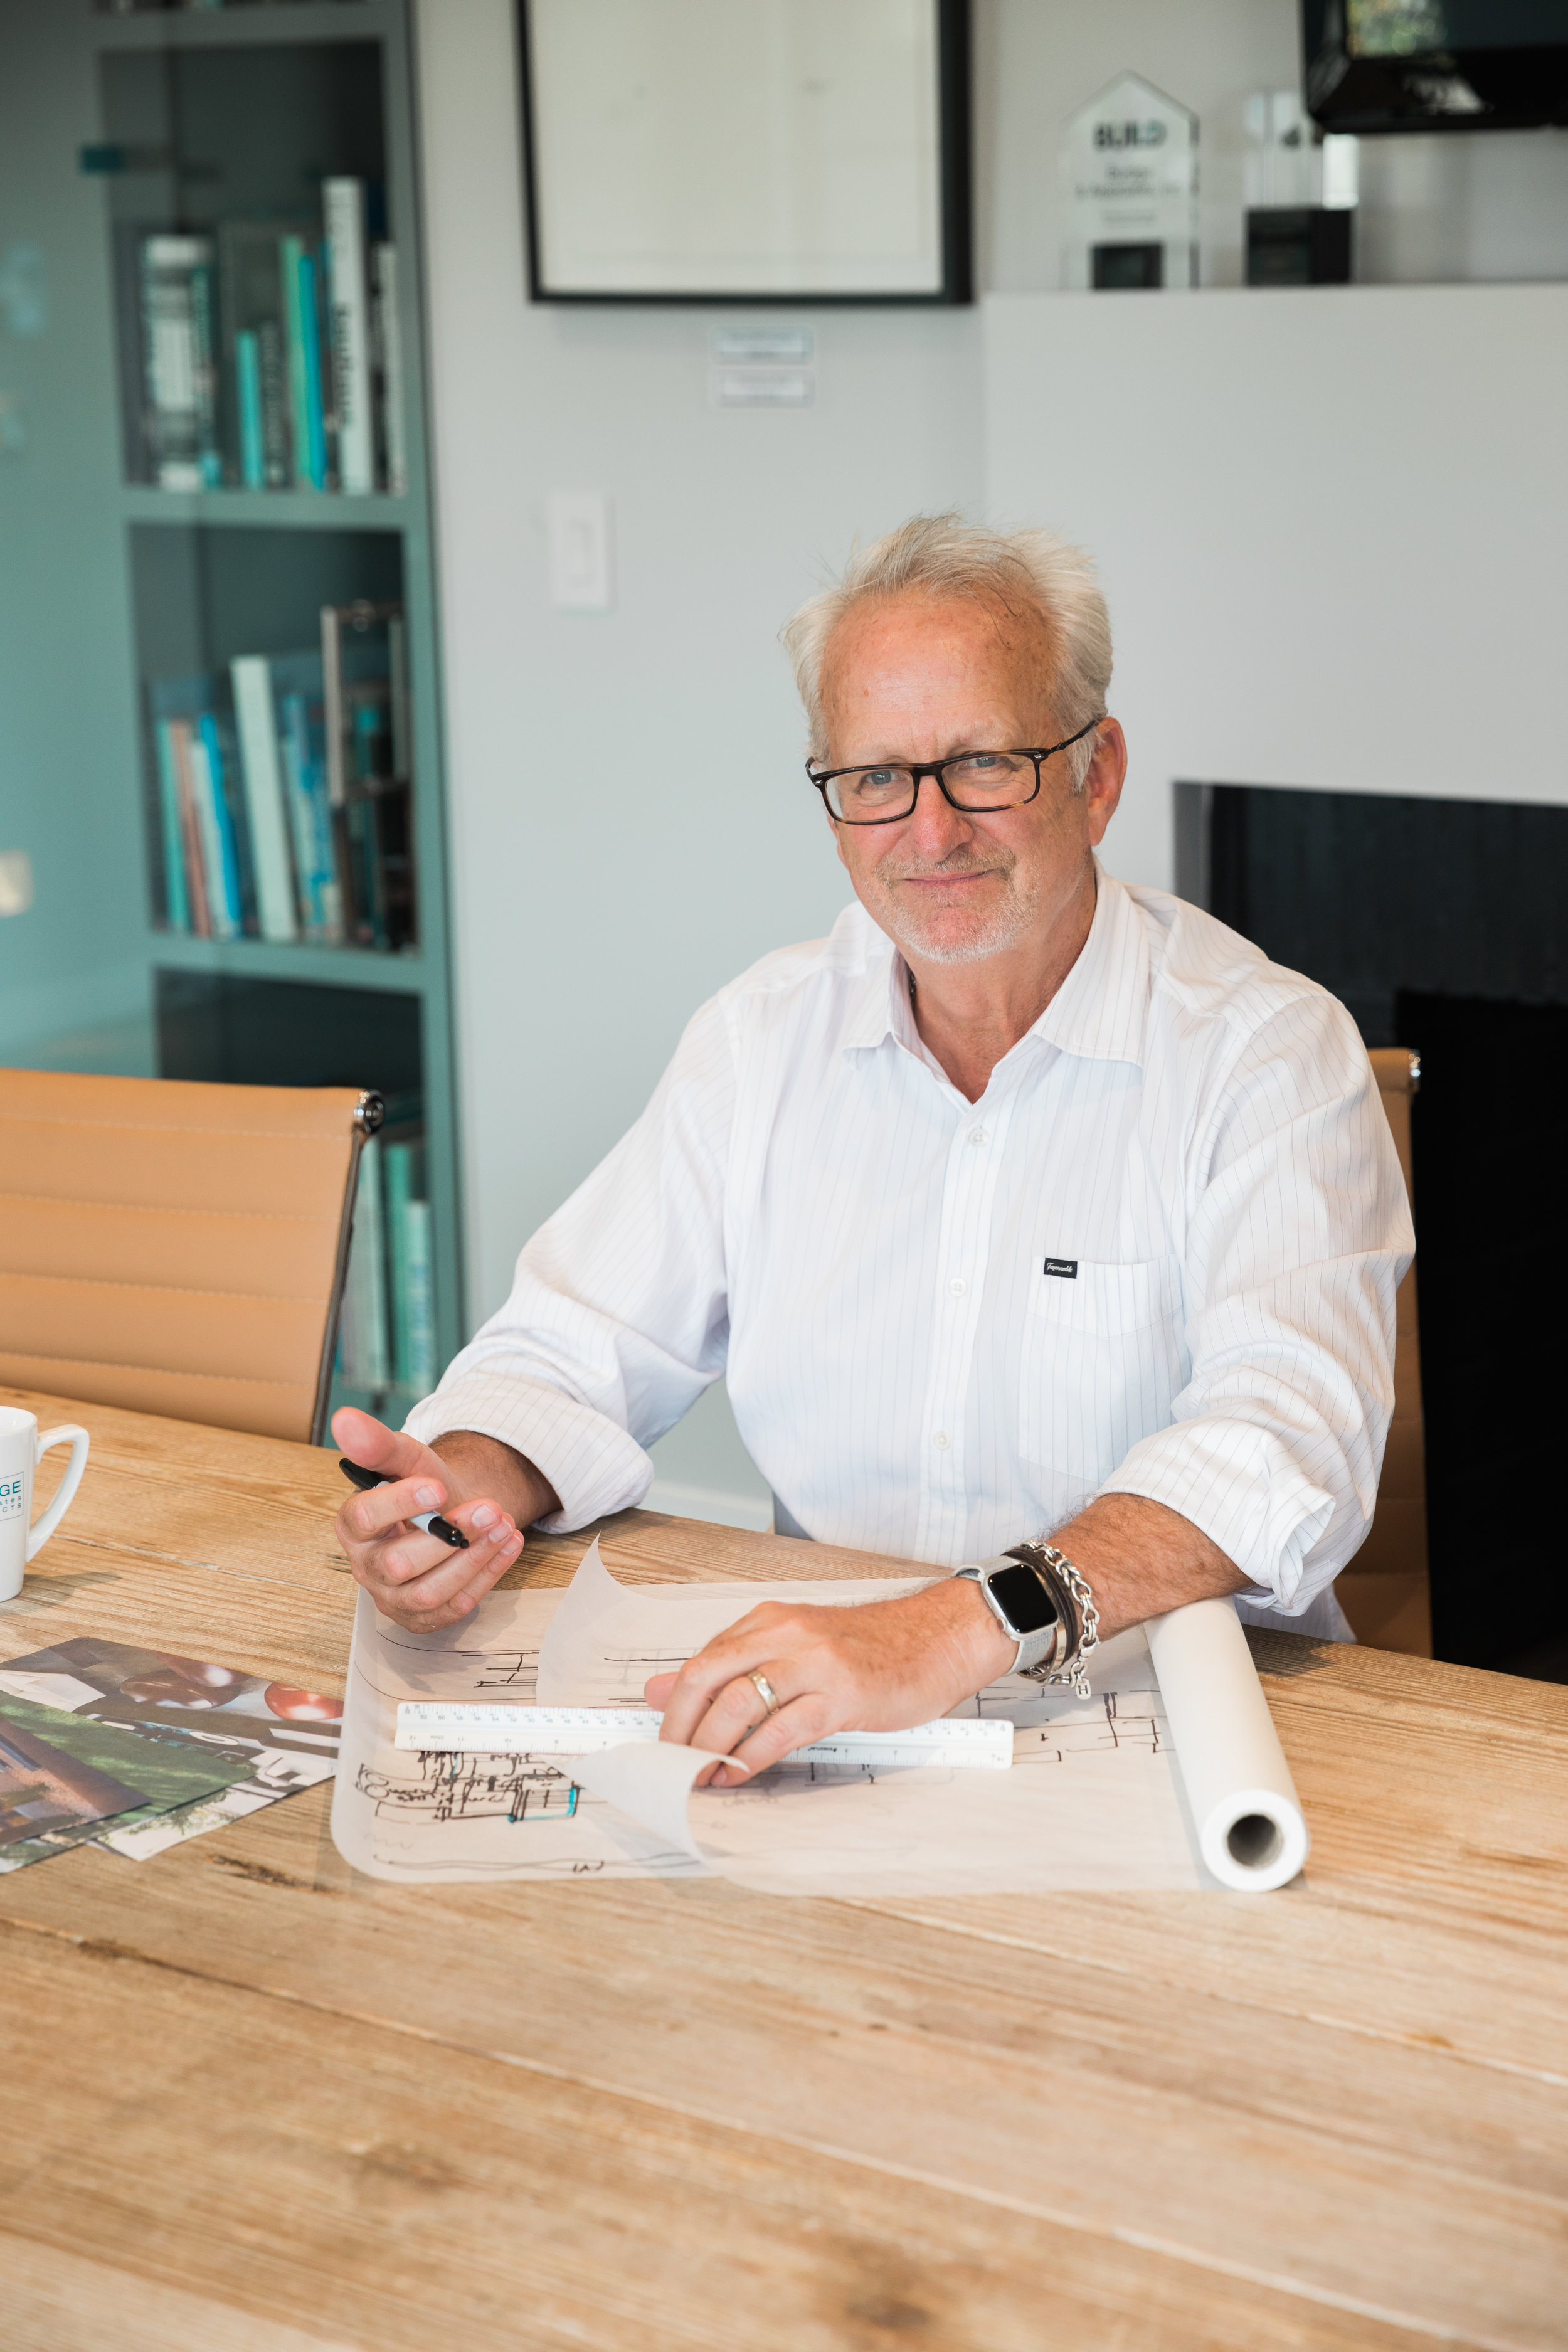 Burdge & Associates Architects principal Doug Burdge.